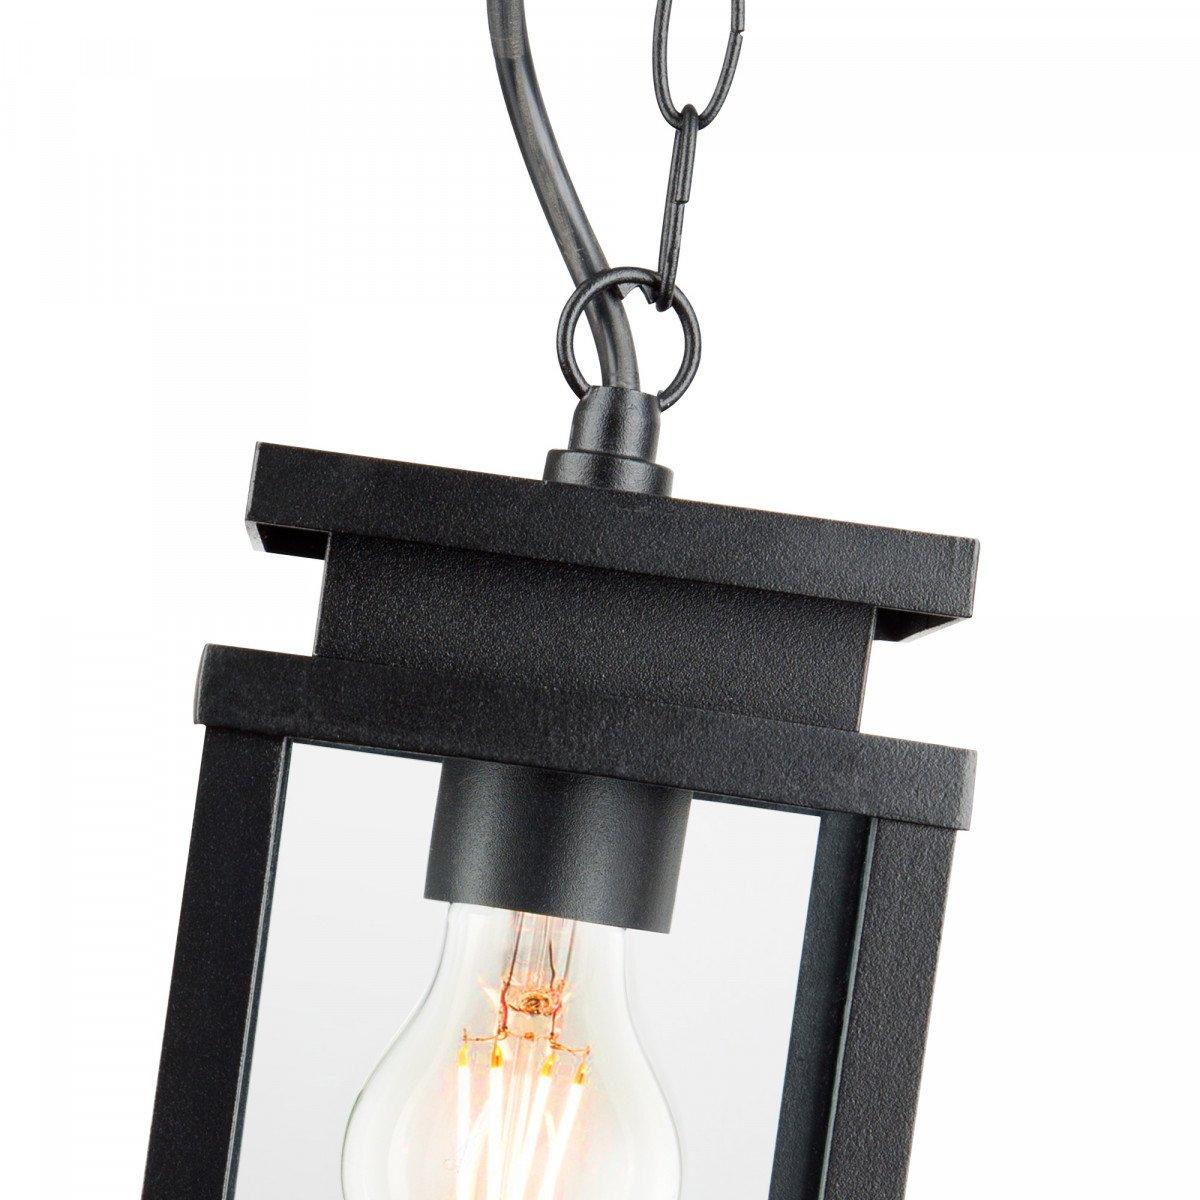 hanglamp jersey aan ketting, strak klassieke buitenverlichting, tijdloos en strak klassieke kettinglamp, verandalamp van KS Verlichting